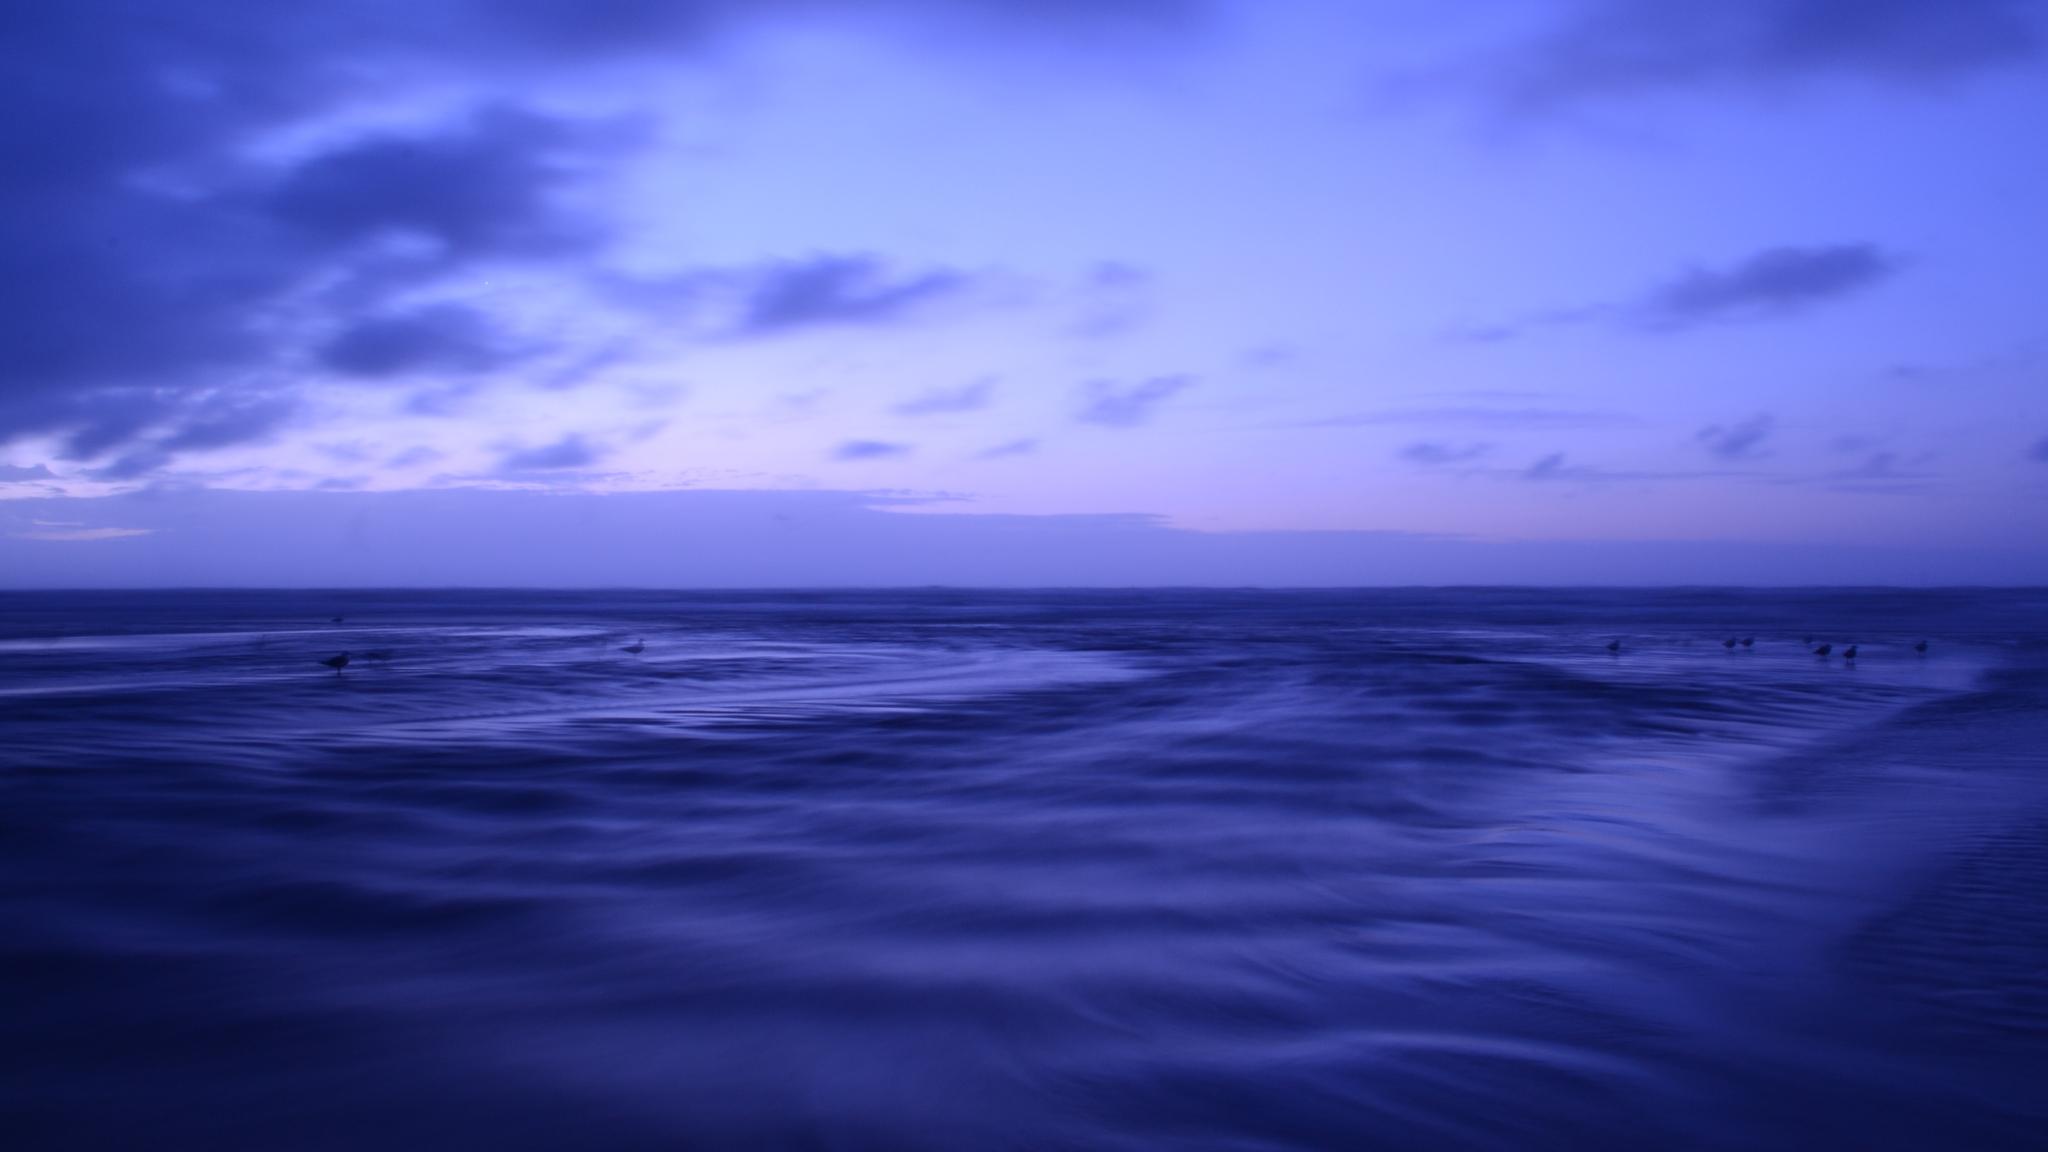 2048x1152 Slik Blue Tone Water Ocean 4k 2048x1152 ...